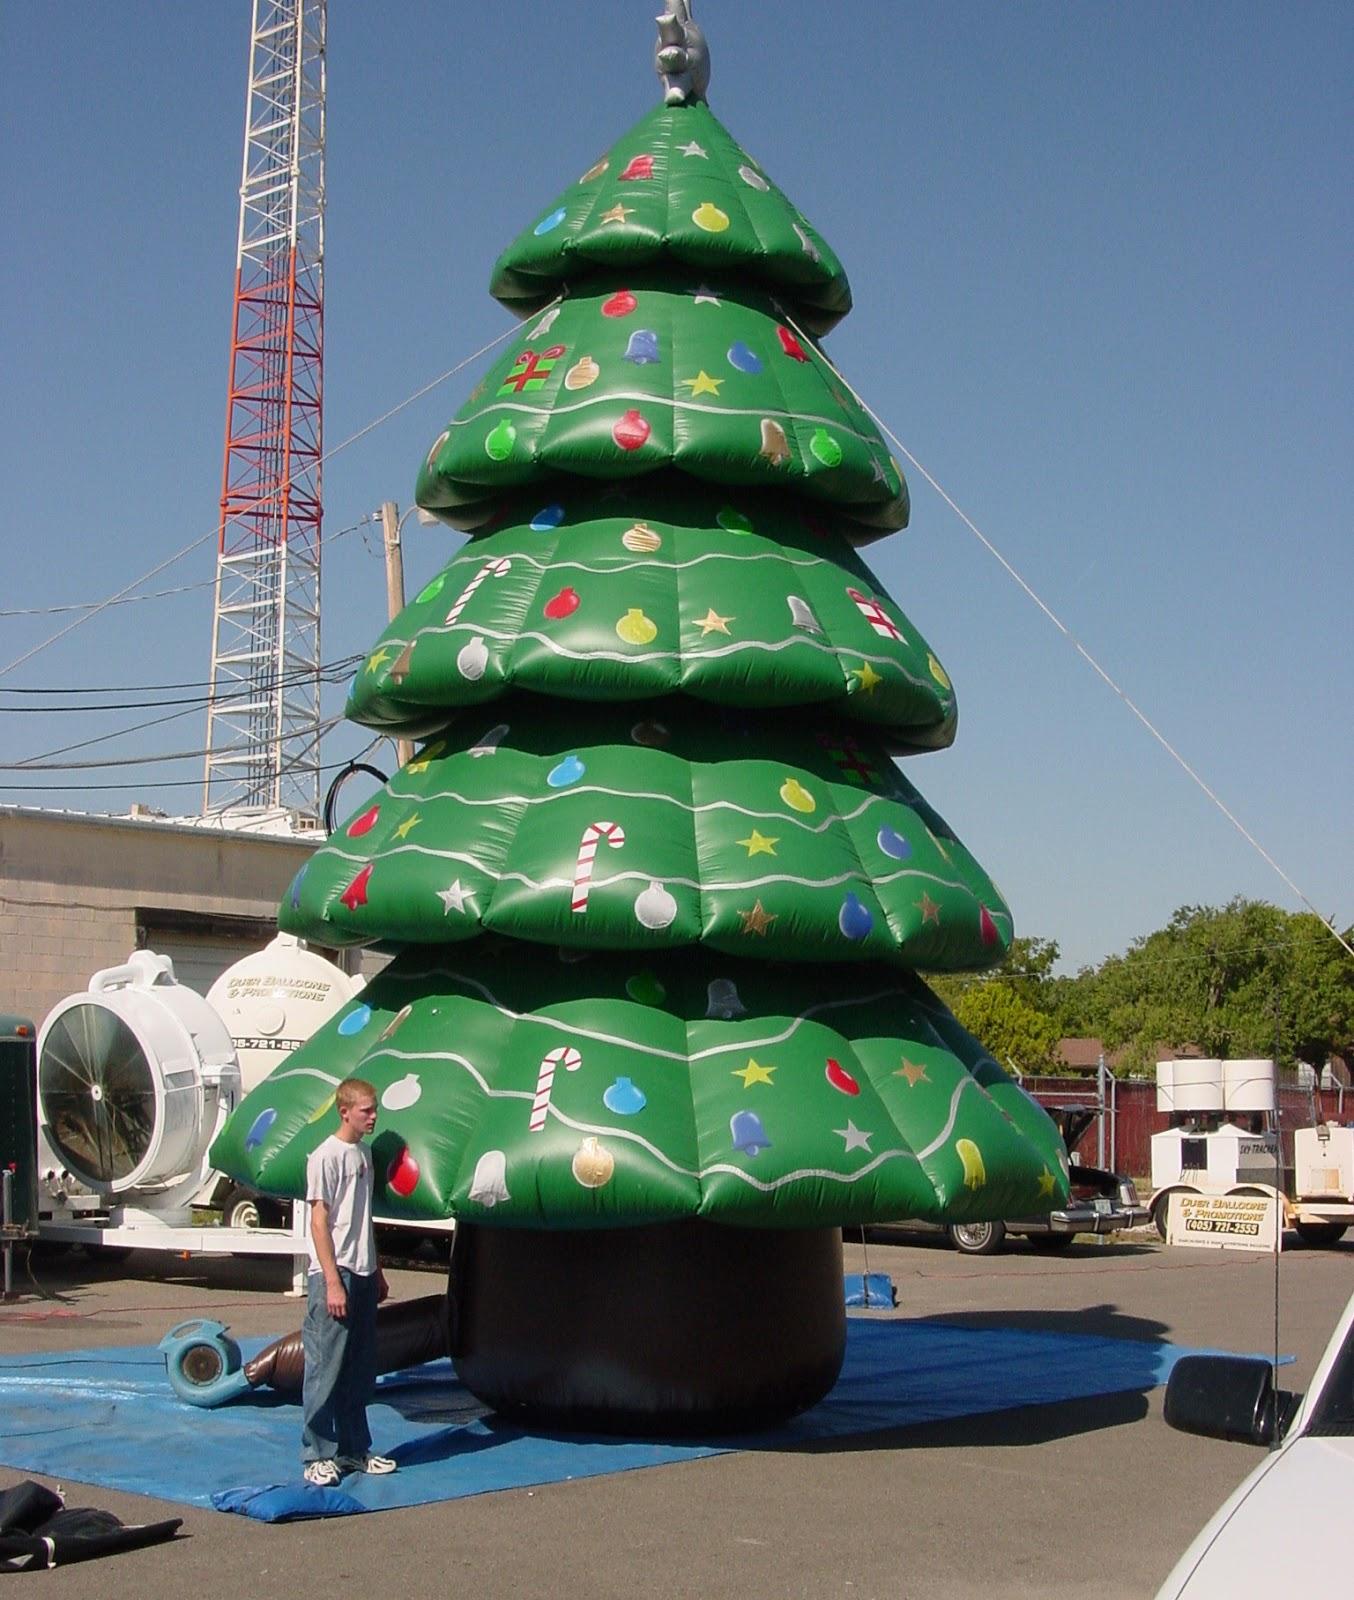 Retro kimmer s amazing christmas trees